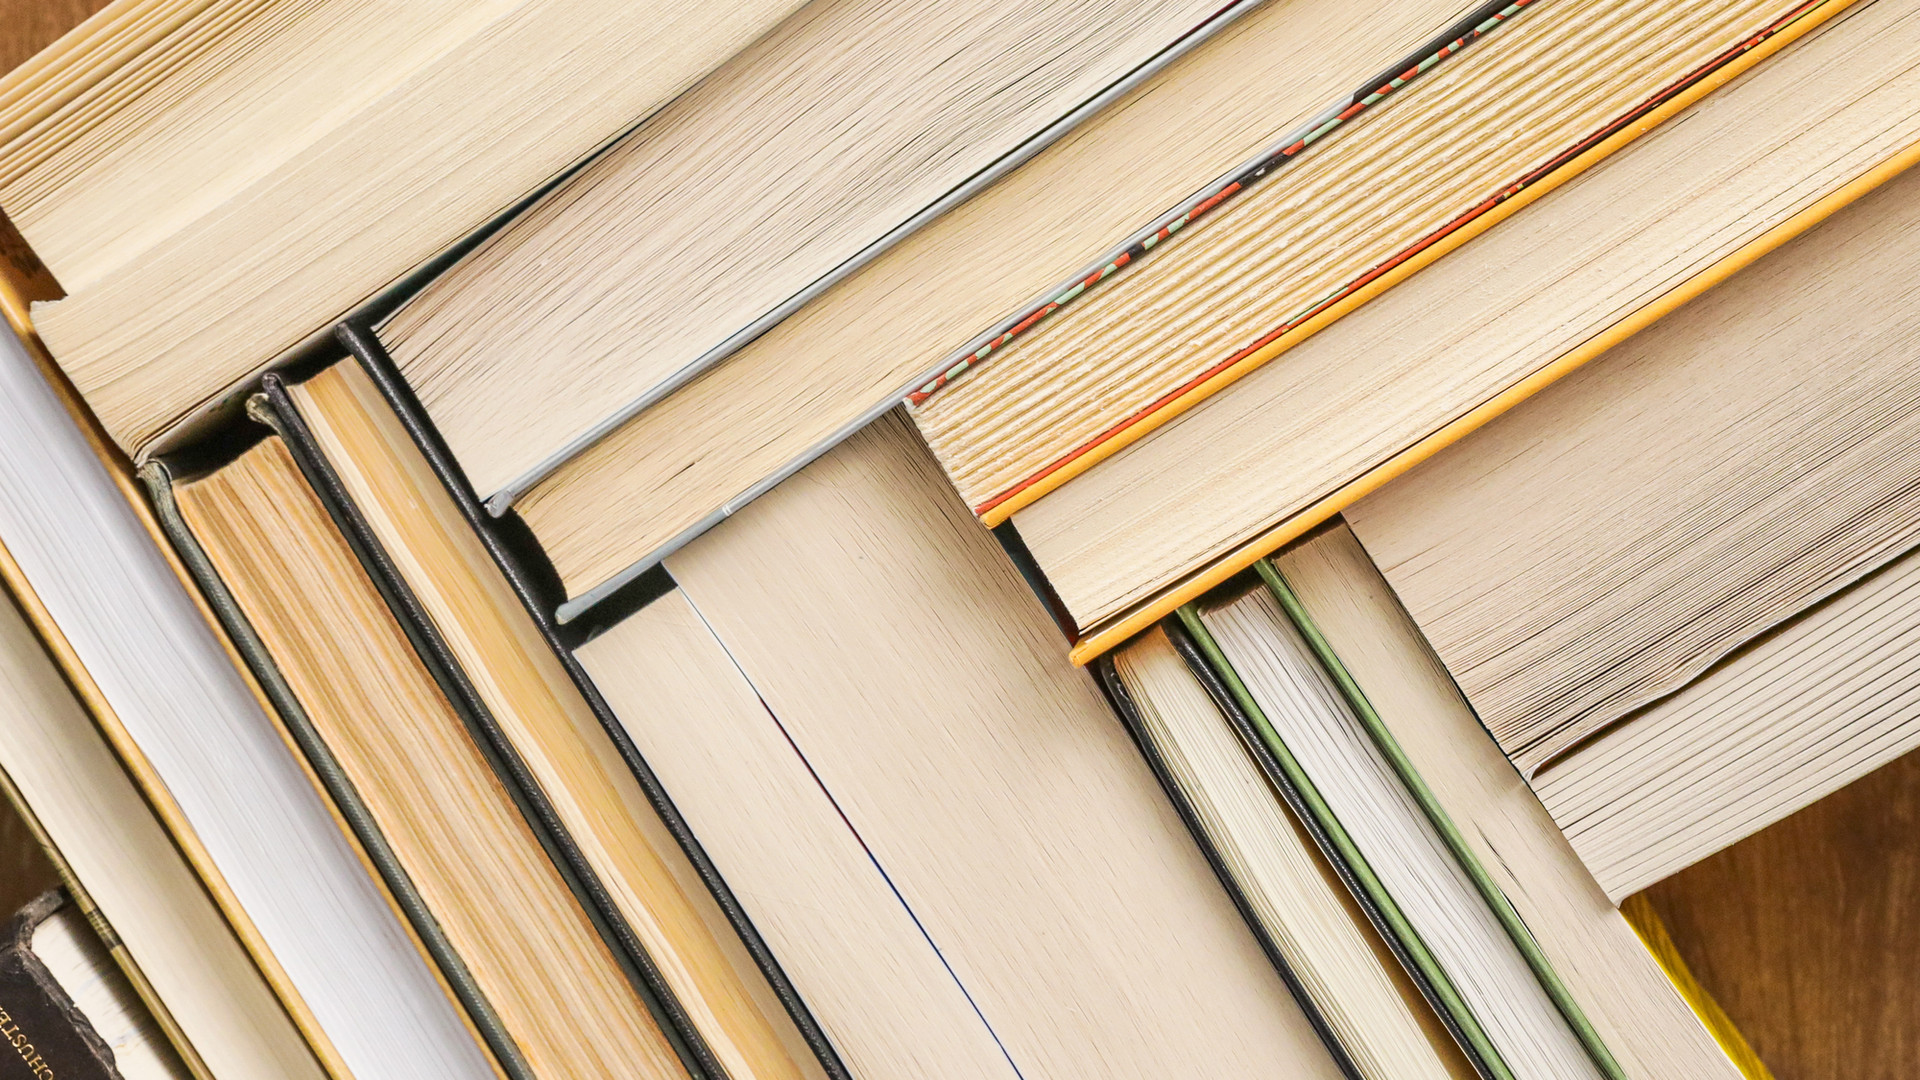 shutterstock_1682003944.jpg